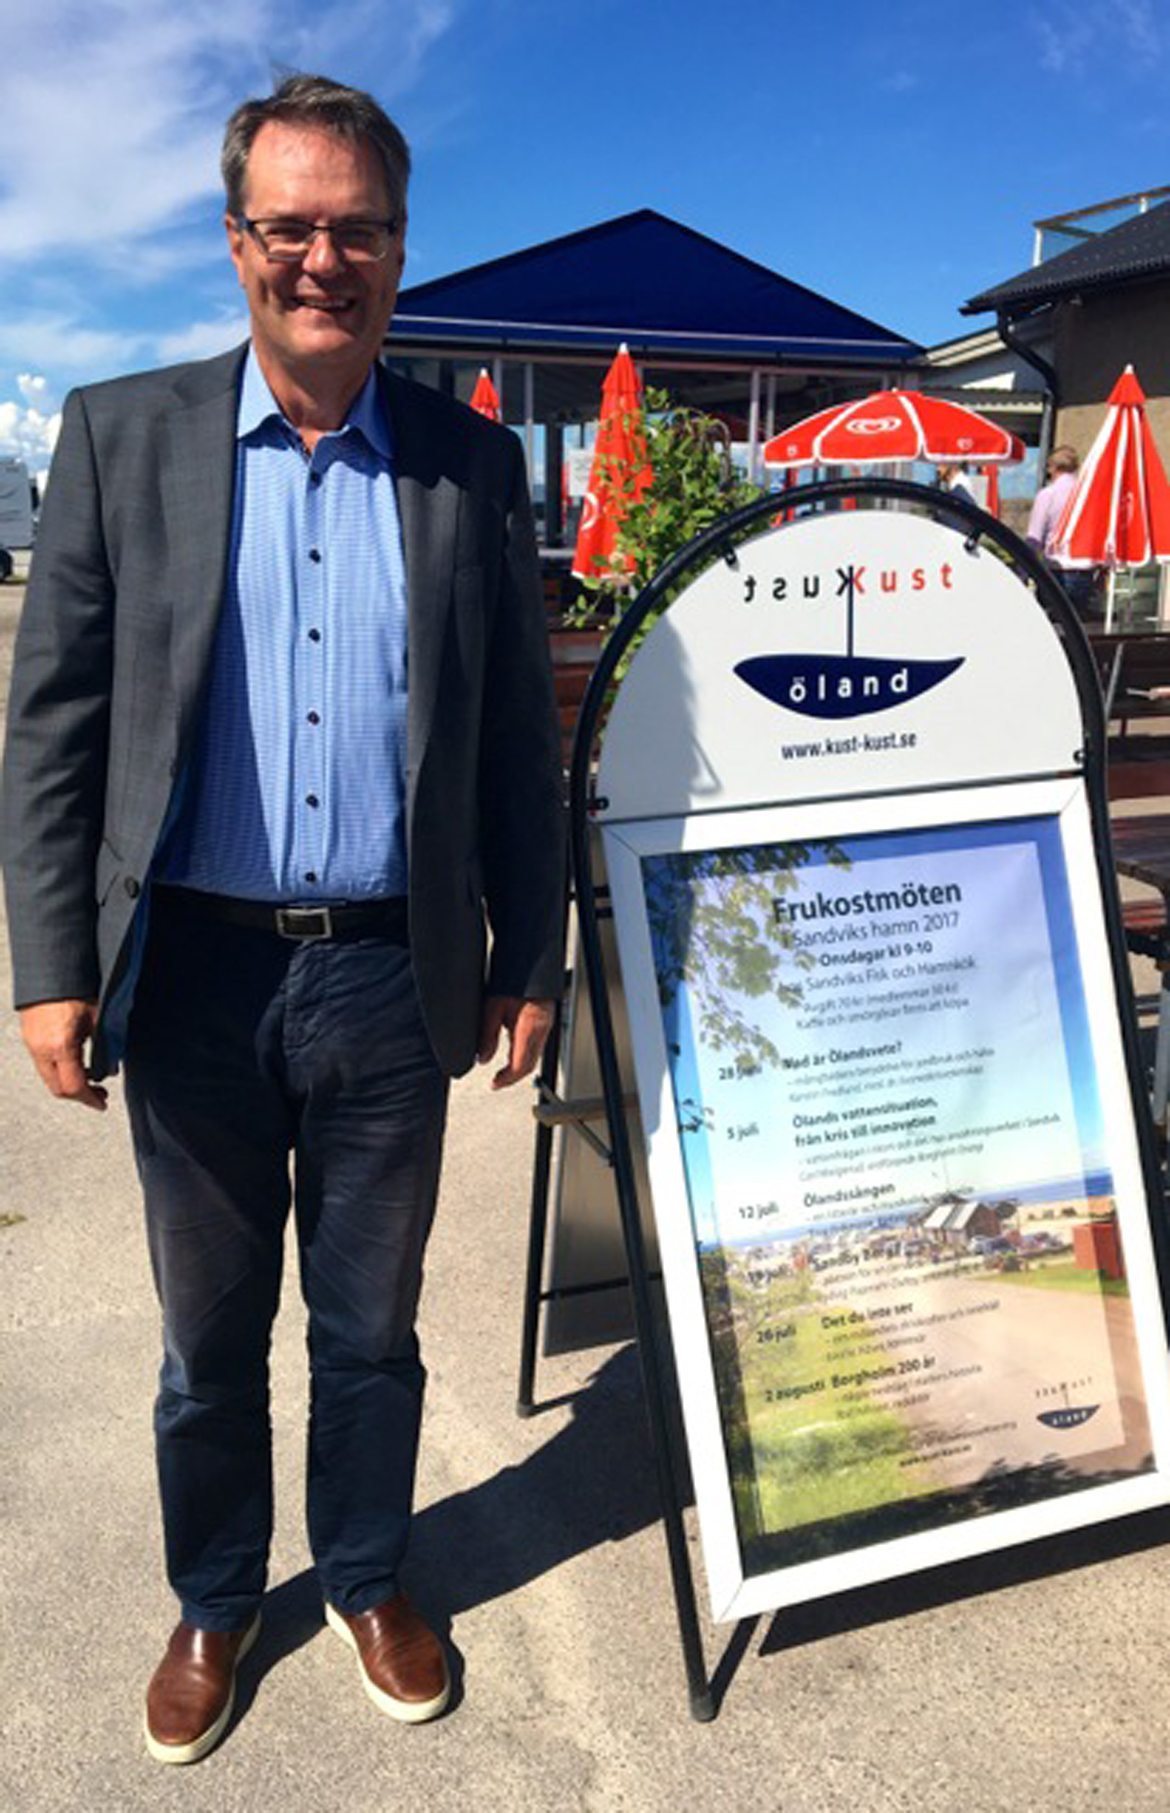 Frukostmöte i Sandvik med Carl Malgerud